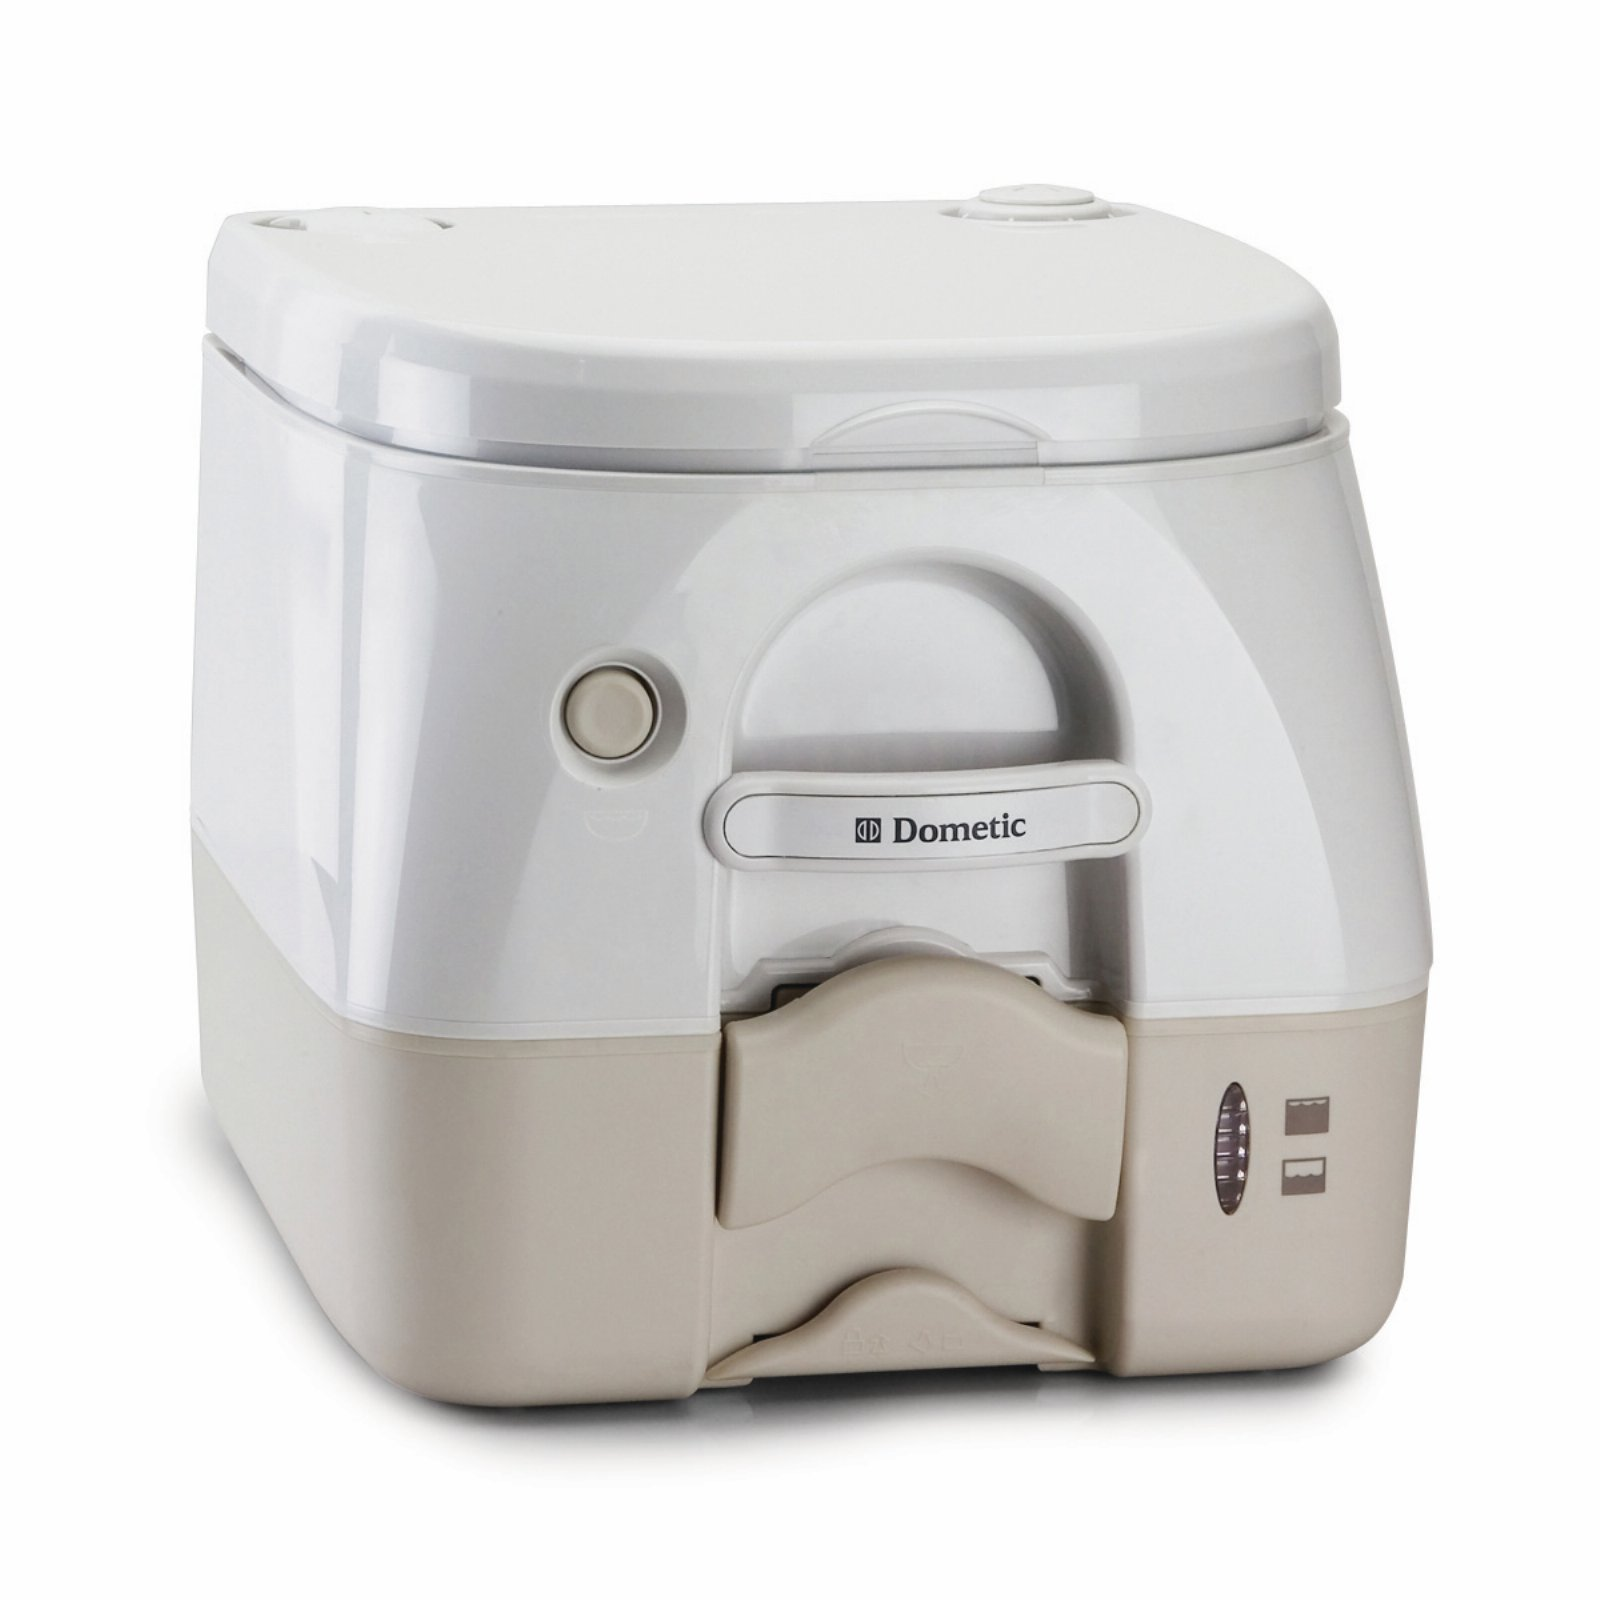 Dometic 301097202 Portable Toilet 2.6 Gallon, Tan